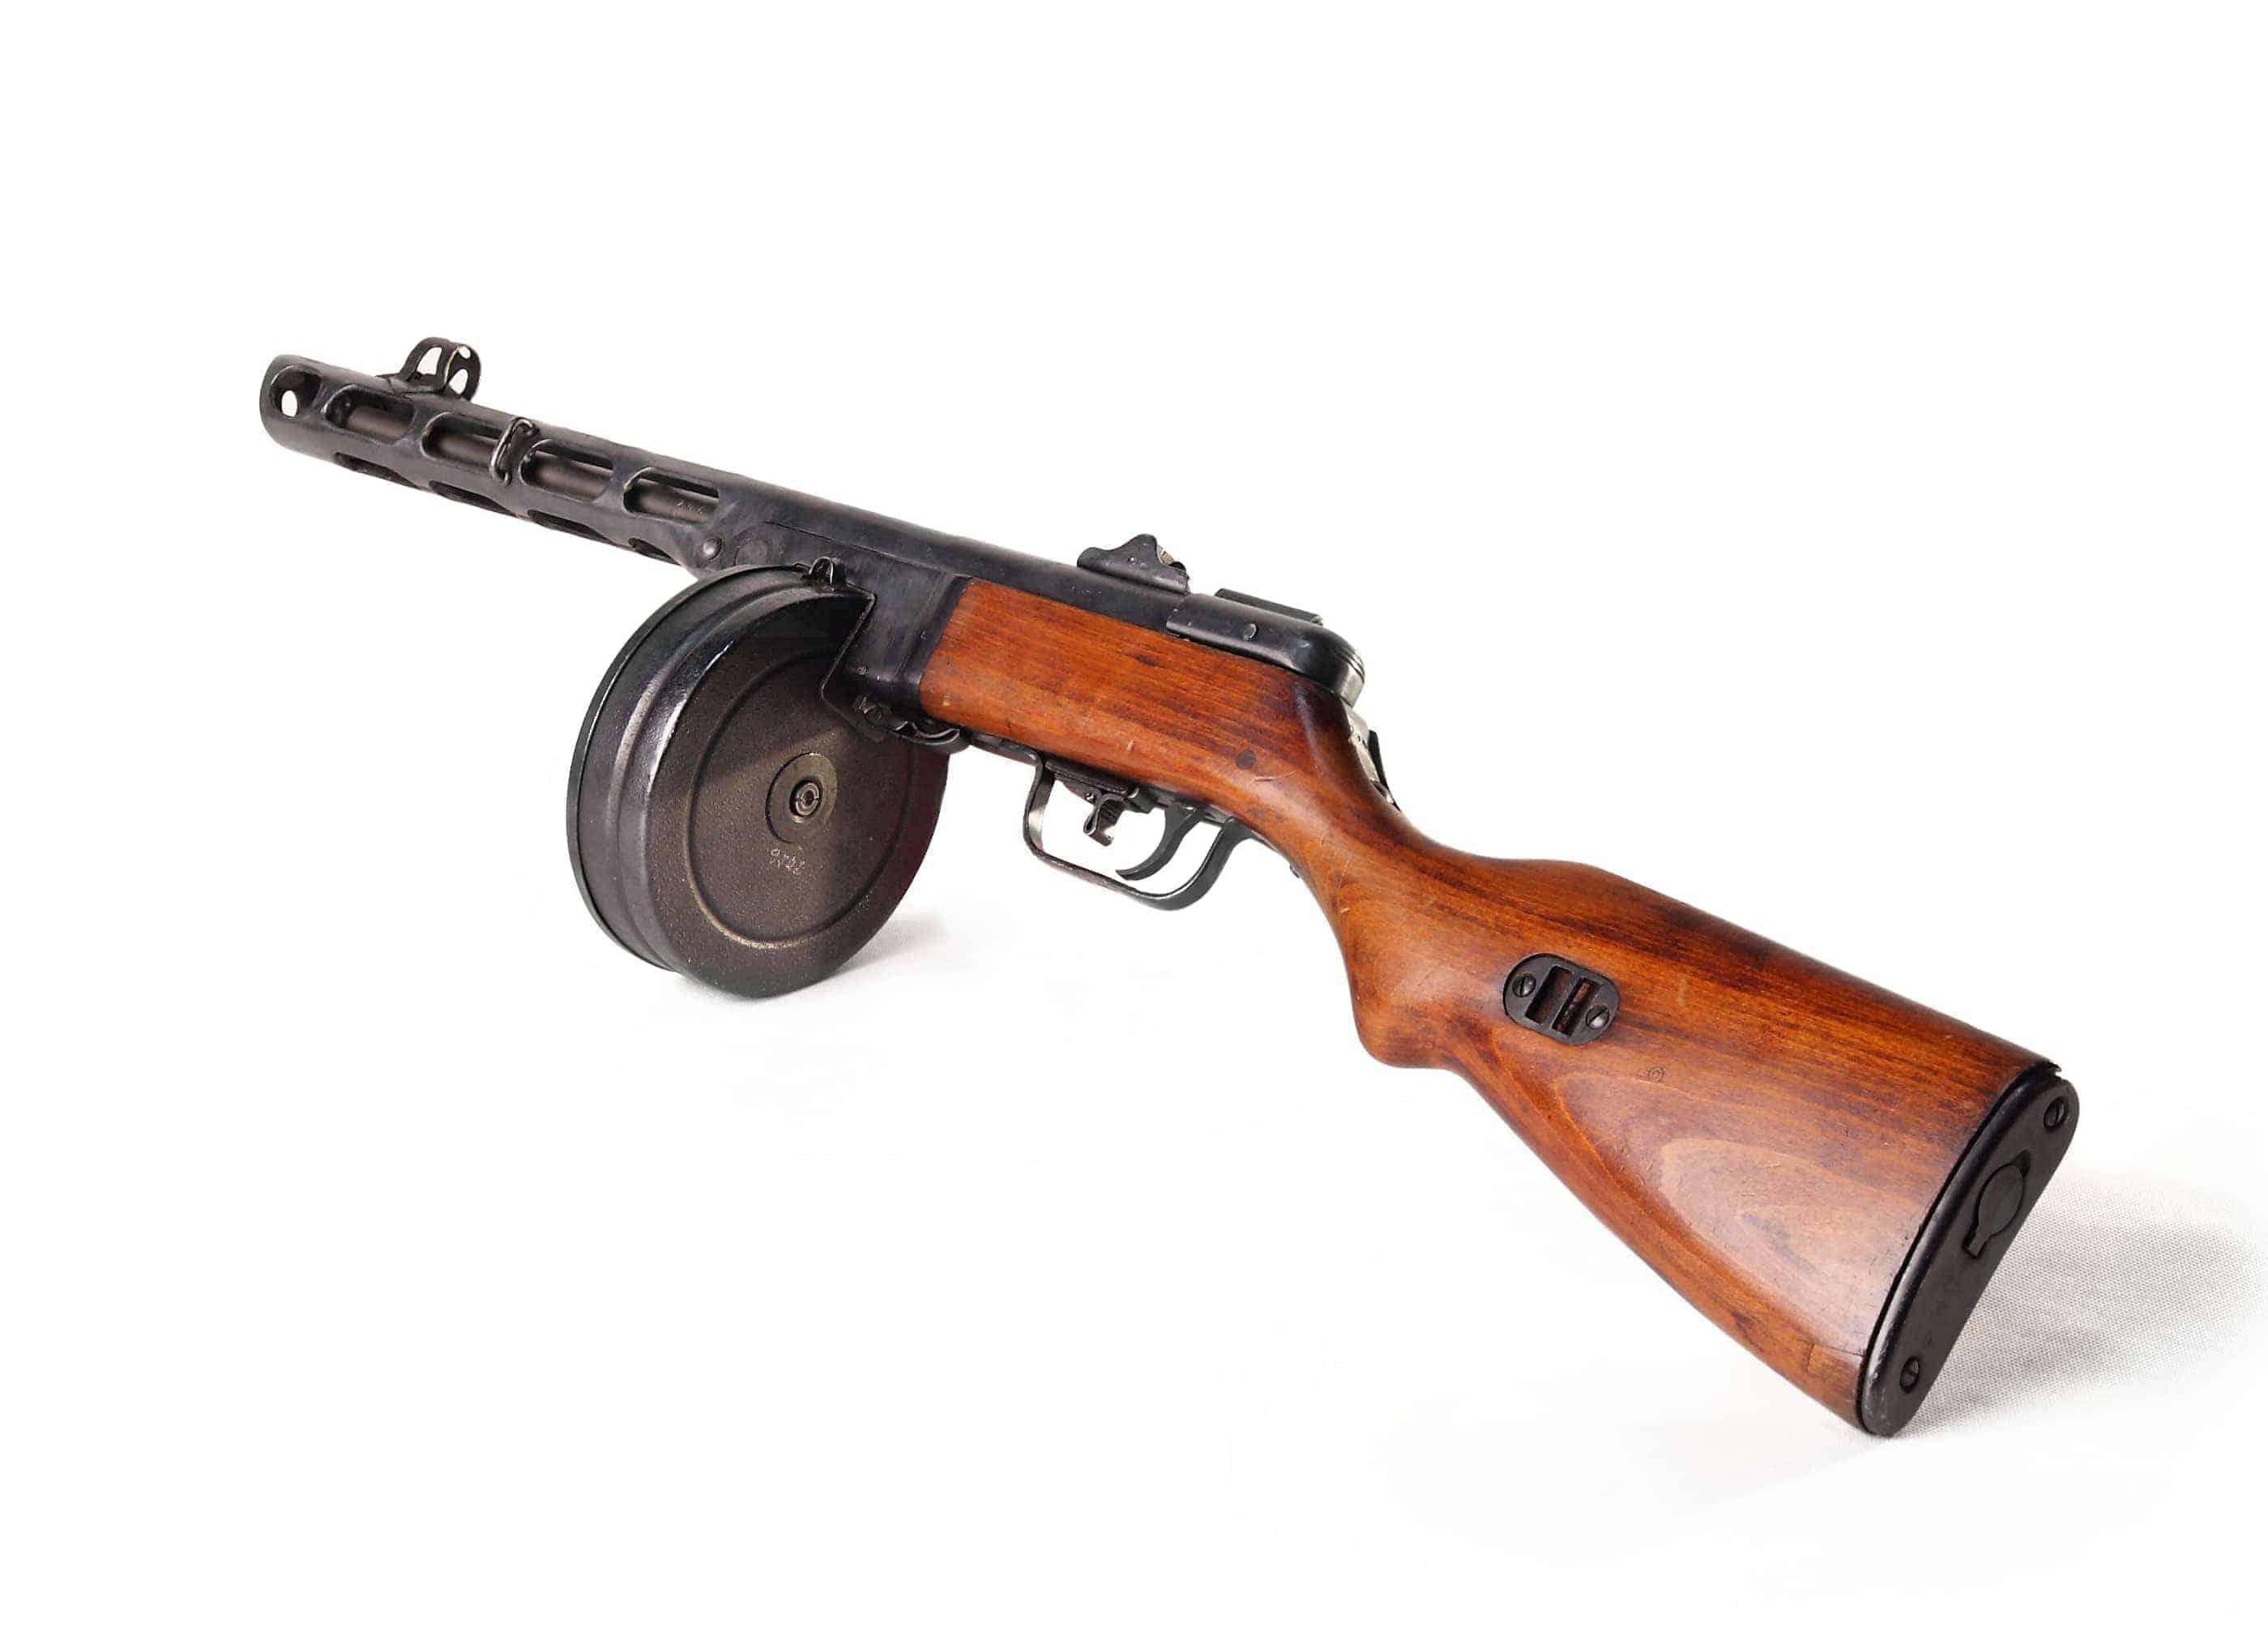 https://strzelnicabojowa.pl/uploads/guns/PPS-20160430-WEB-WIDE.JPG